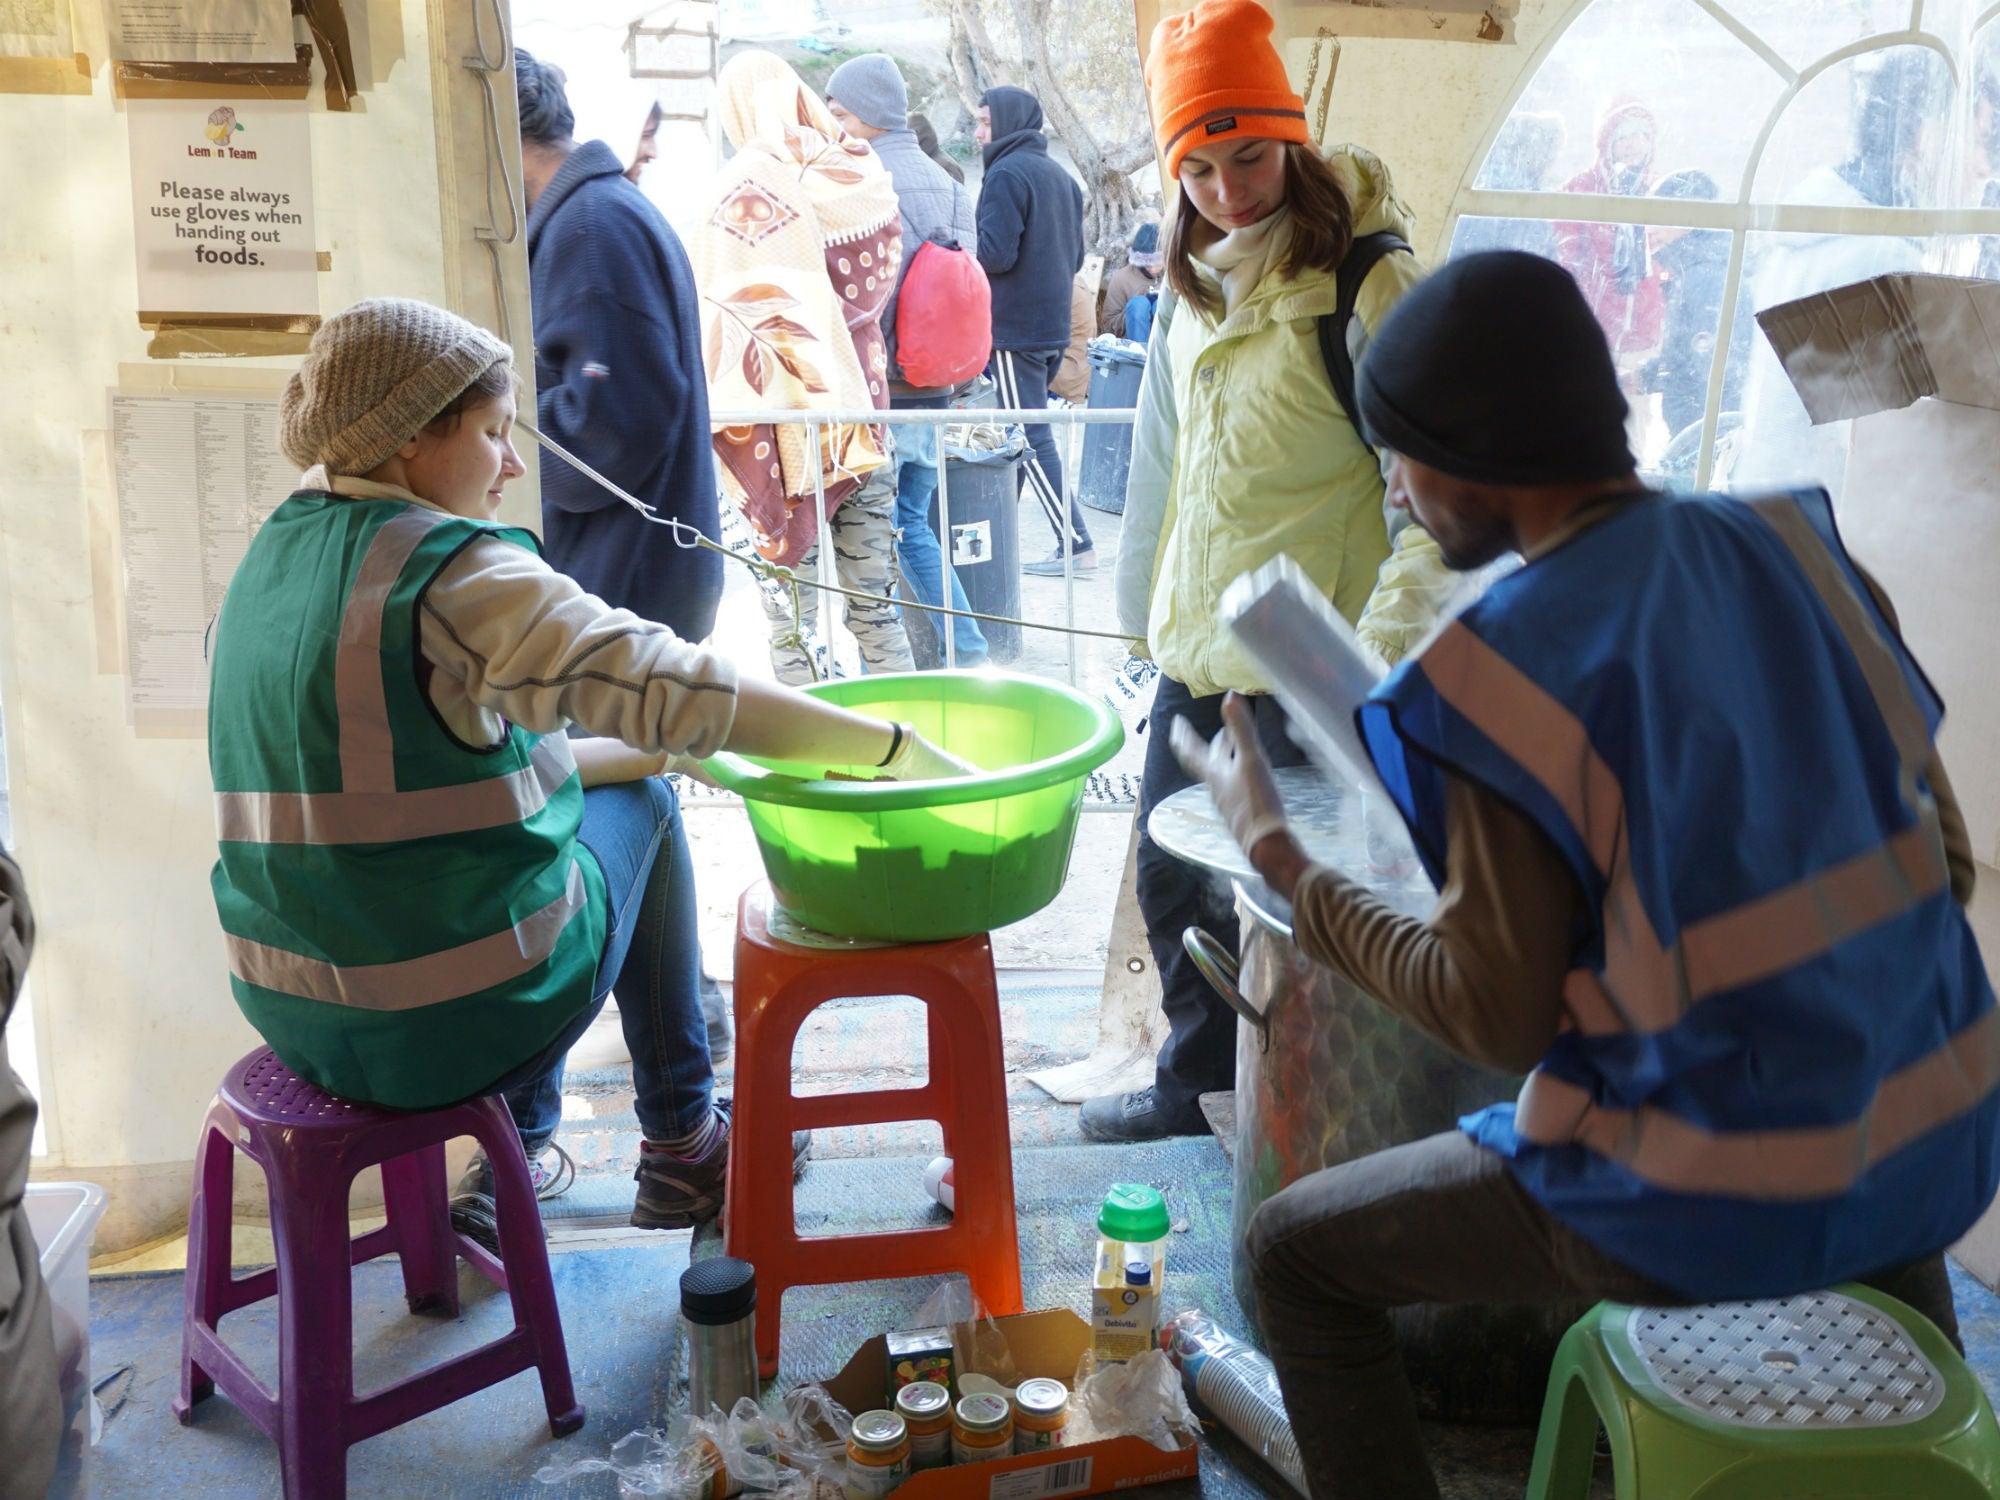 How a Greek Refugee Camp Served a Taste of Home